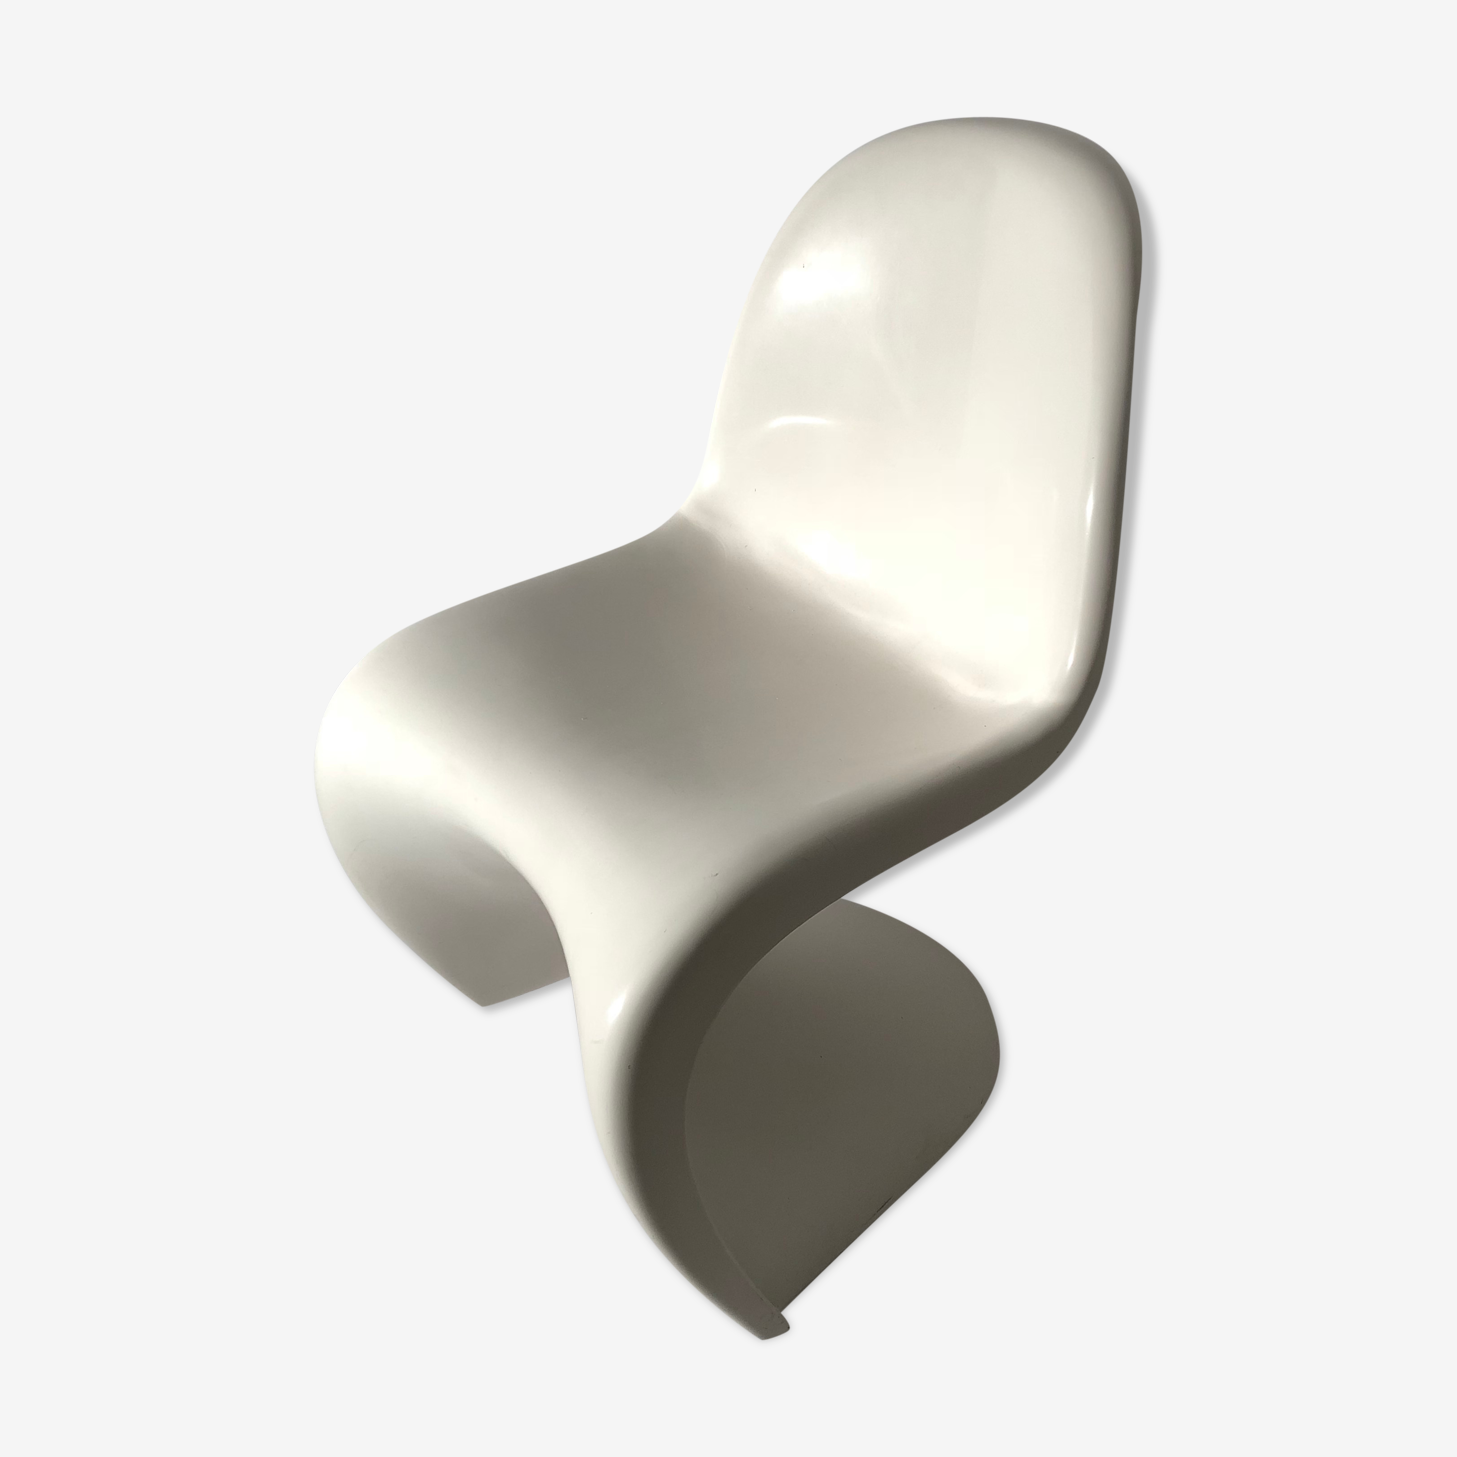 Panton chair edition Herman Miller